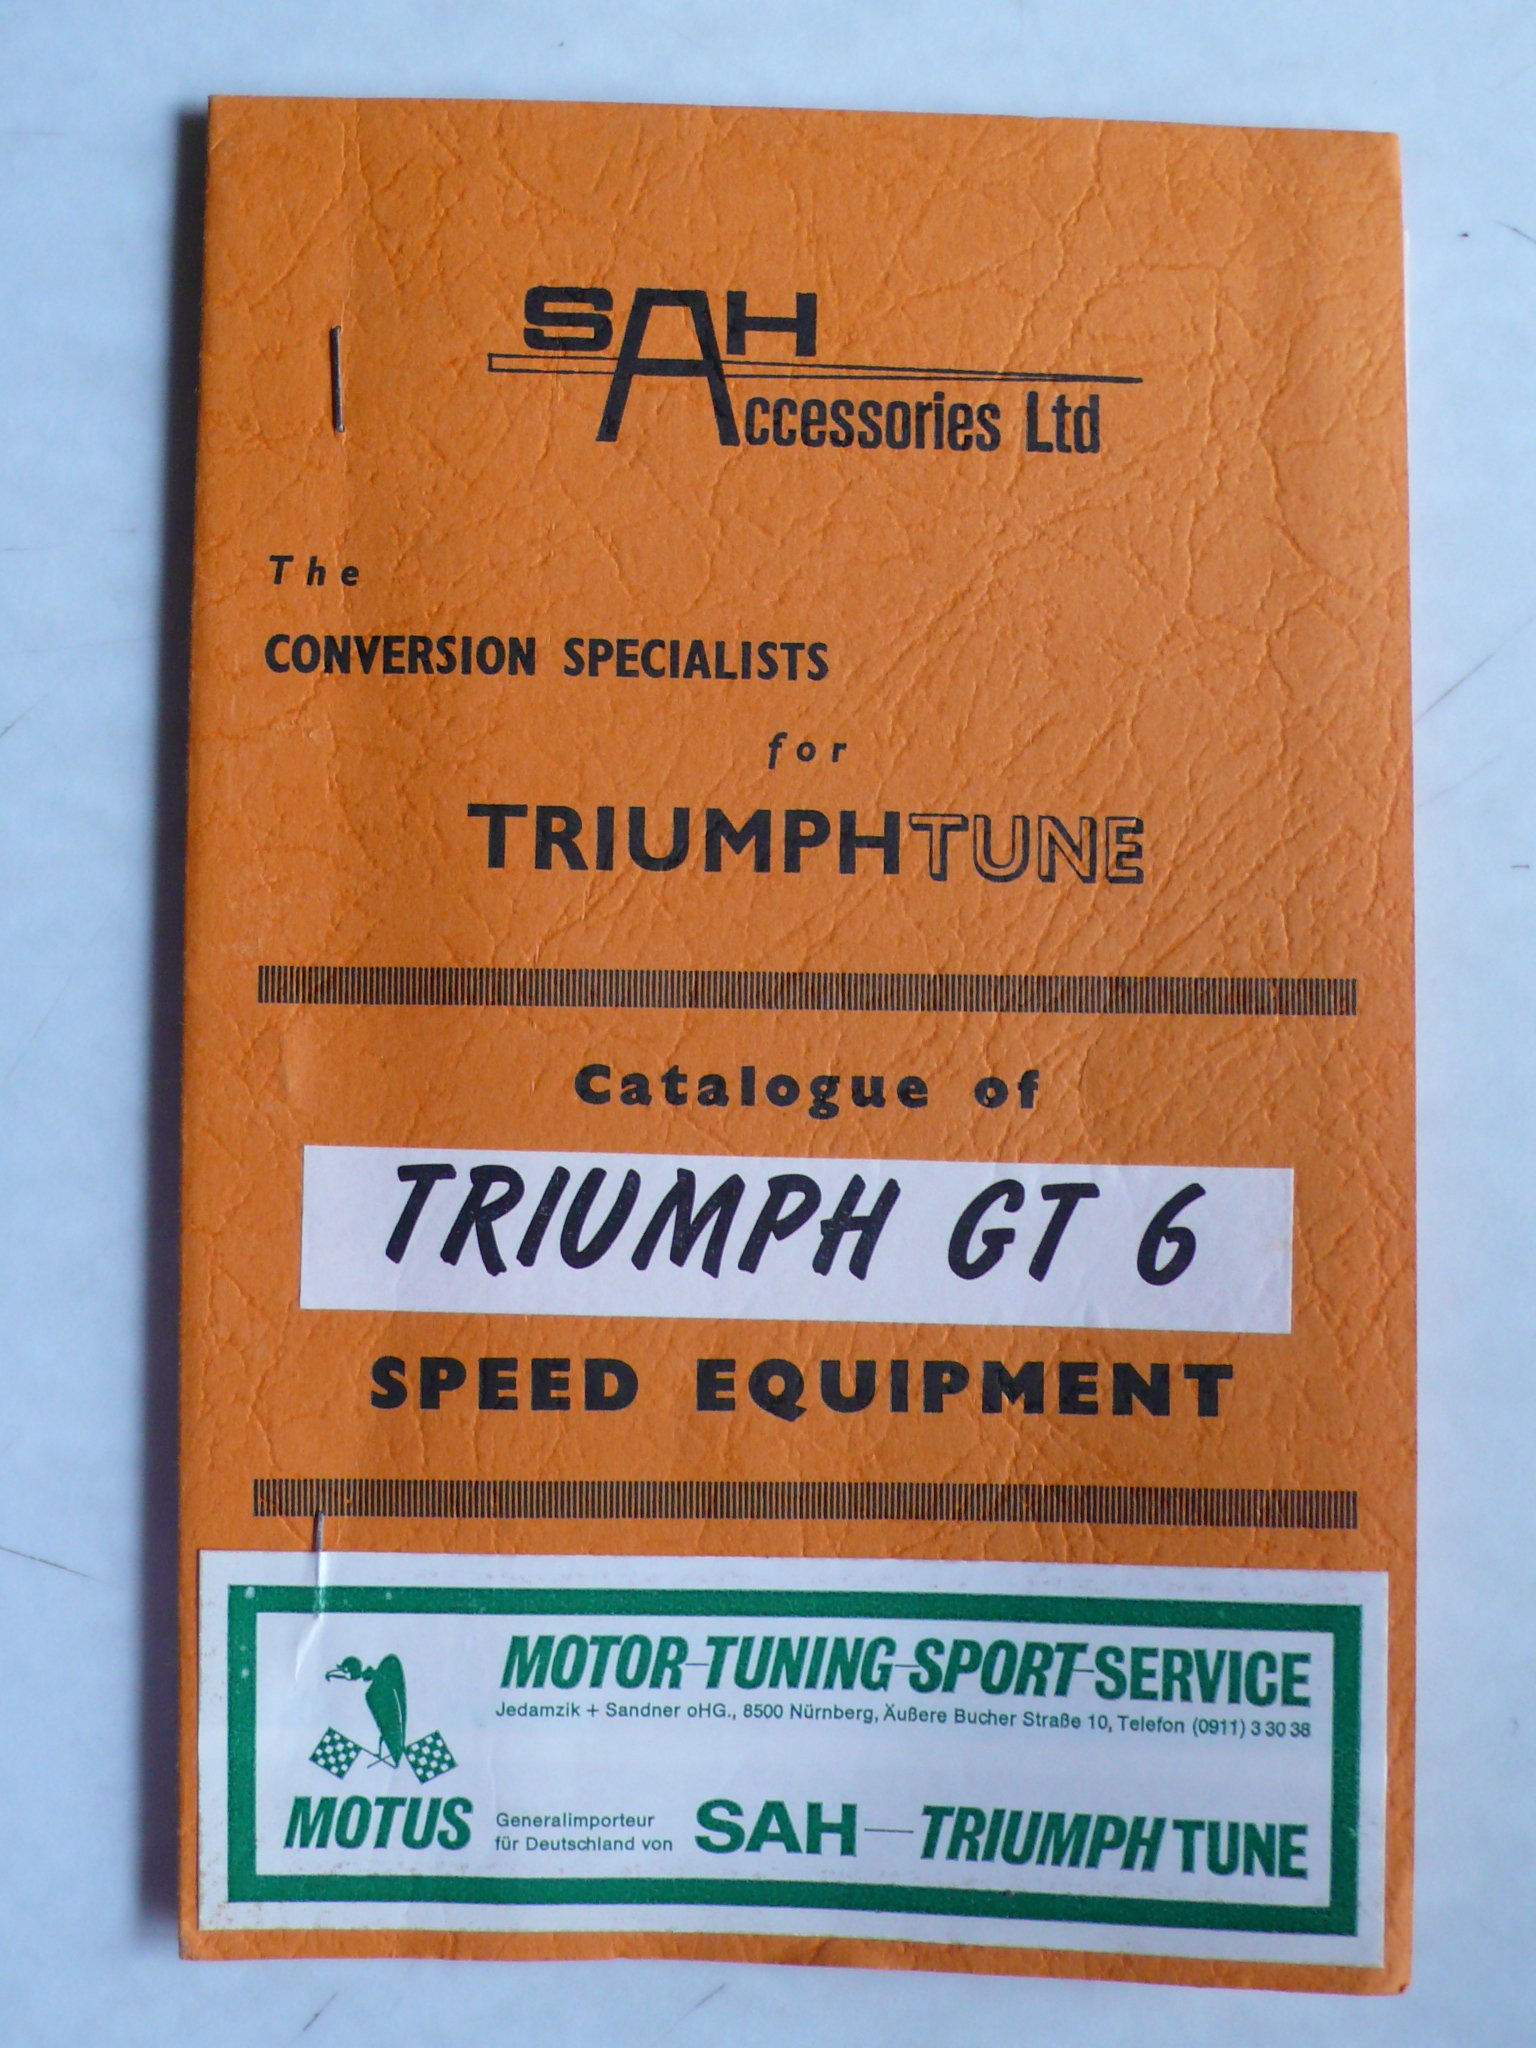 Image result for Triumphtune SAH logo